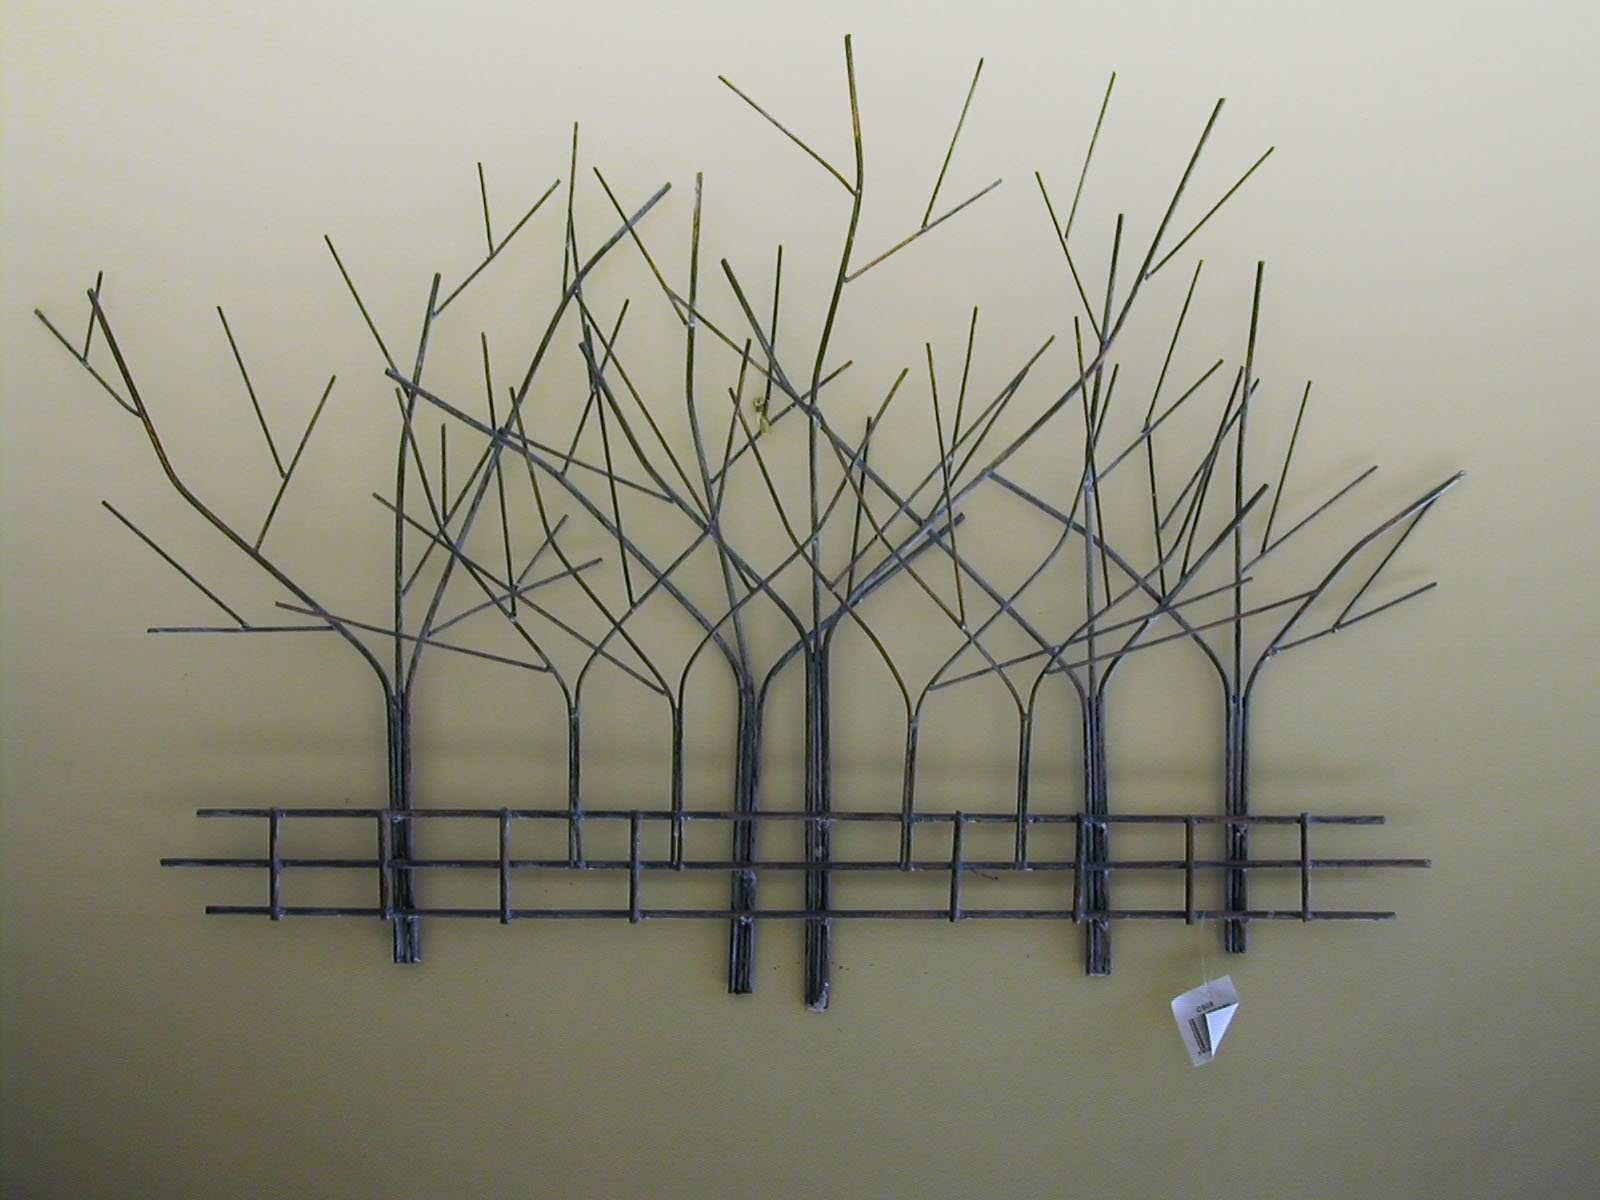 Metal Tree Wall Art New Art Sculptures For Home Metal Tree Wall Art with regard to Metal Tree Wall Art (Image 11 of 21)